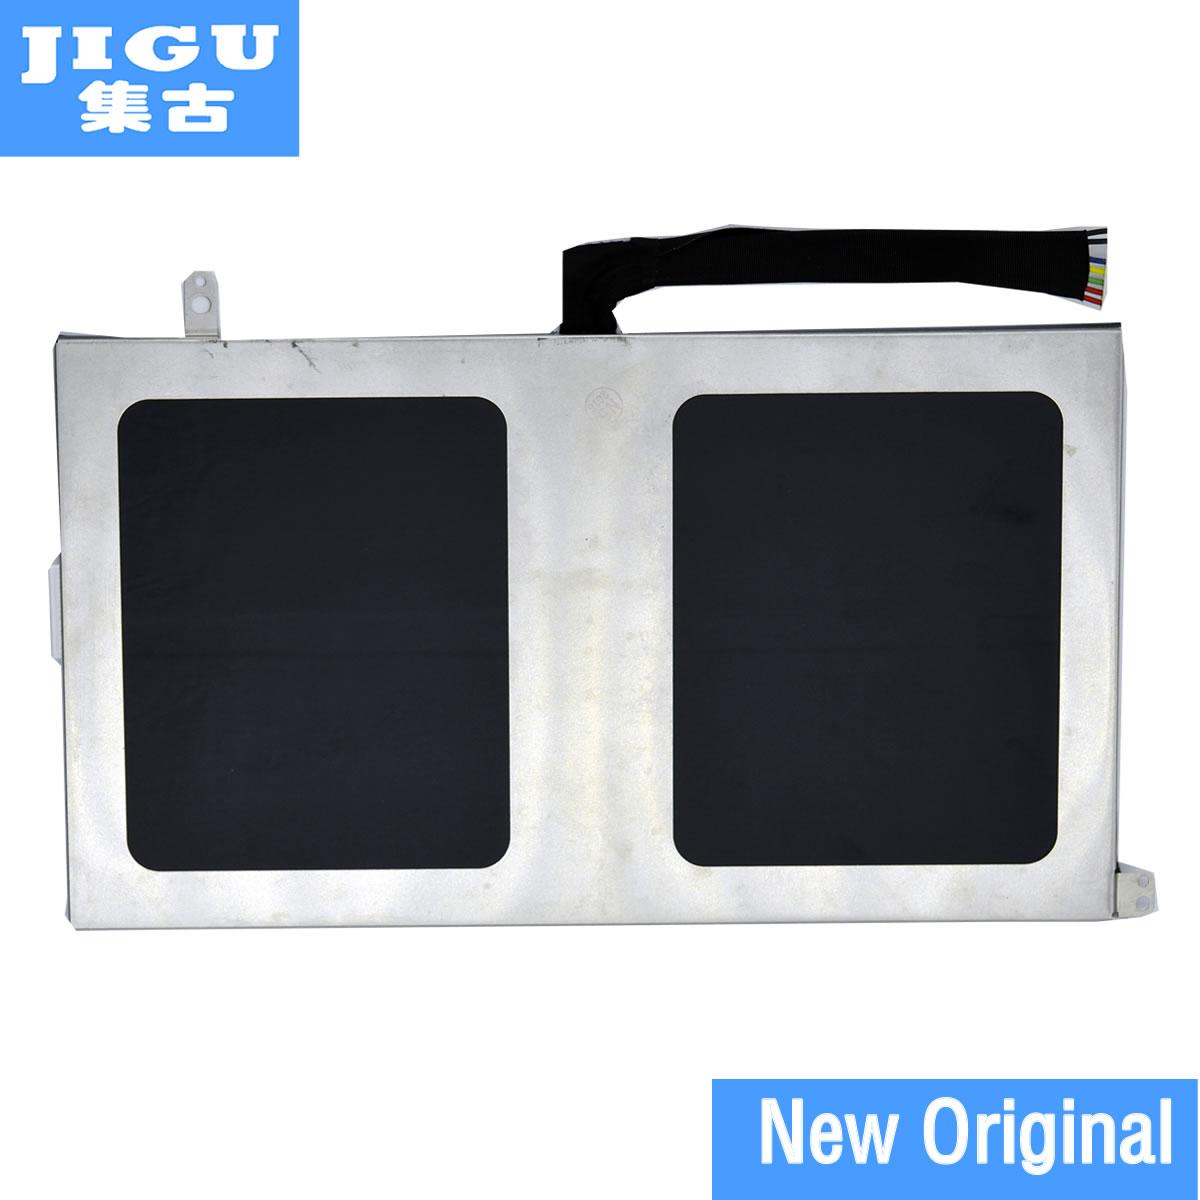 JIGU Original FPCBP345Z Laptop Battery for Fujitsu LifeBook UH572 UH552 Ultrabook FMVNBP219 FPB0280 FPCBP345Z 14.8V 2840mAh 10 8v 5800mah original new fpcbp179 battery for fujitsu lifebook s6420 s6421 s6410 s6520 s6510 s7210 s7220 fmvnbp160 fpcbp179ap